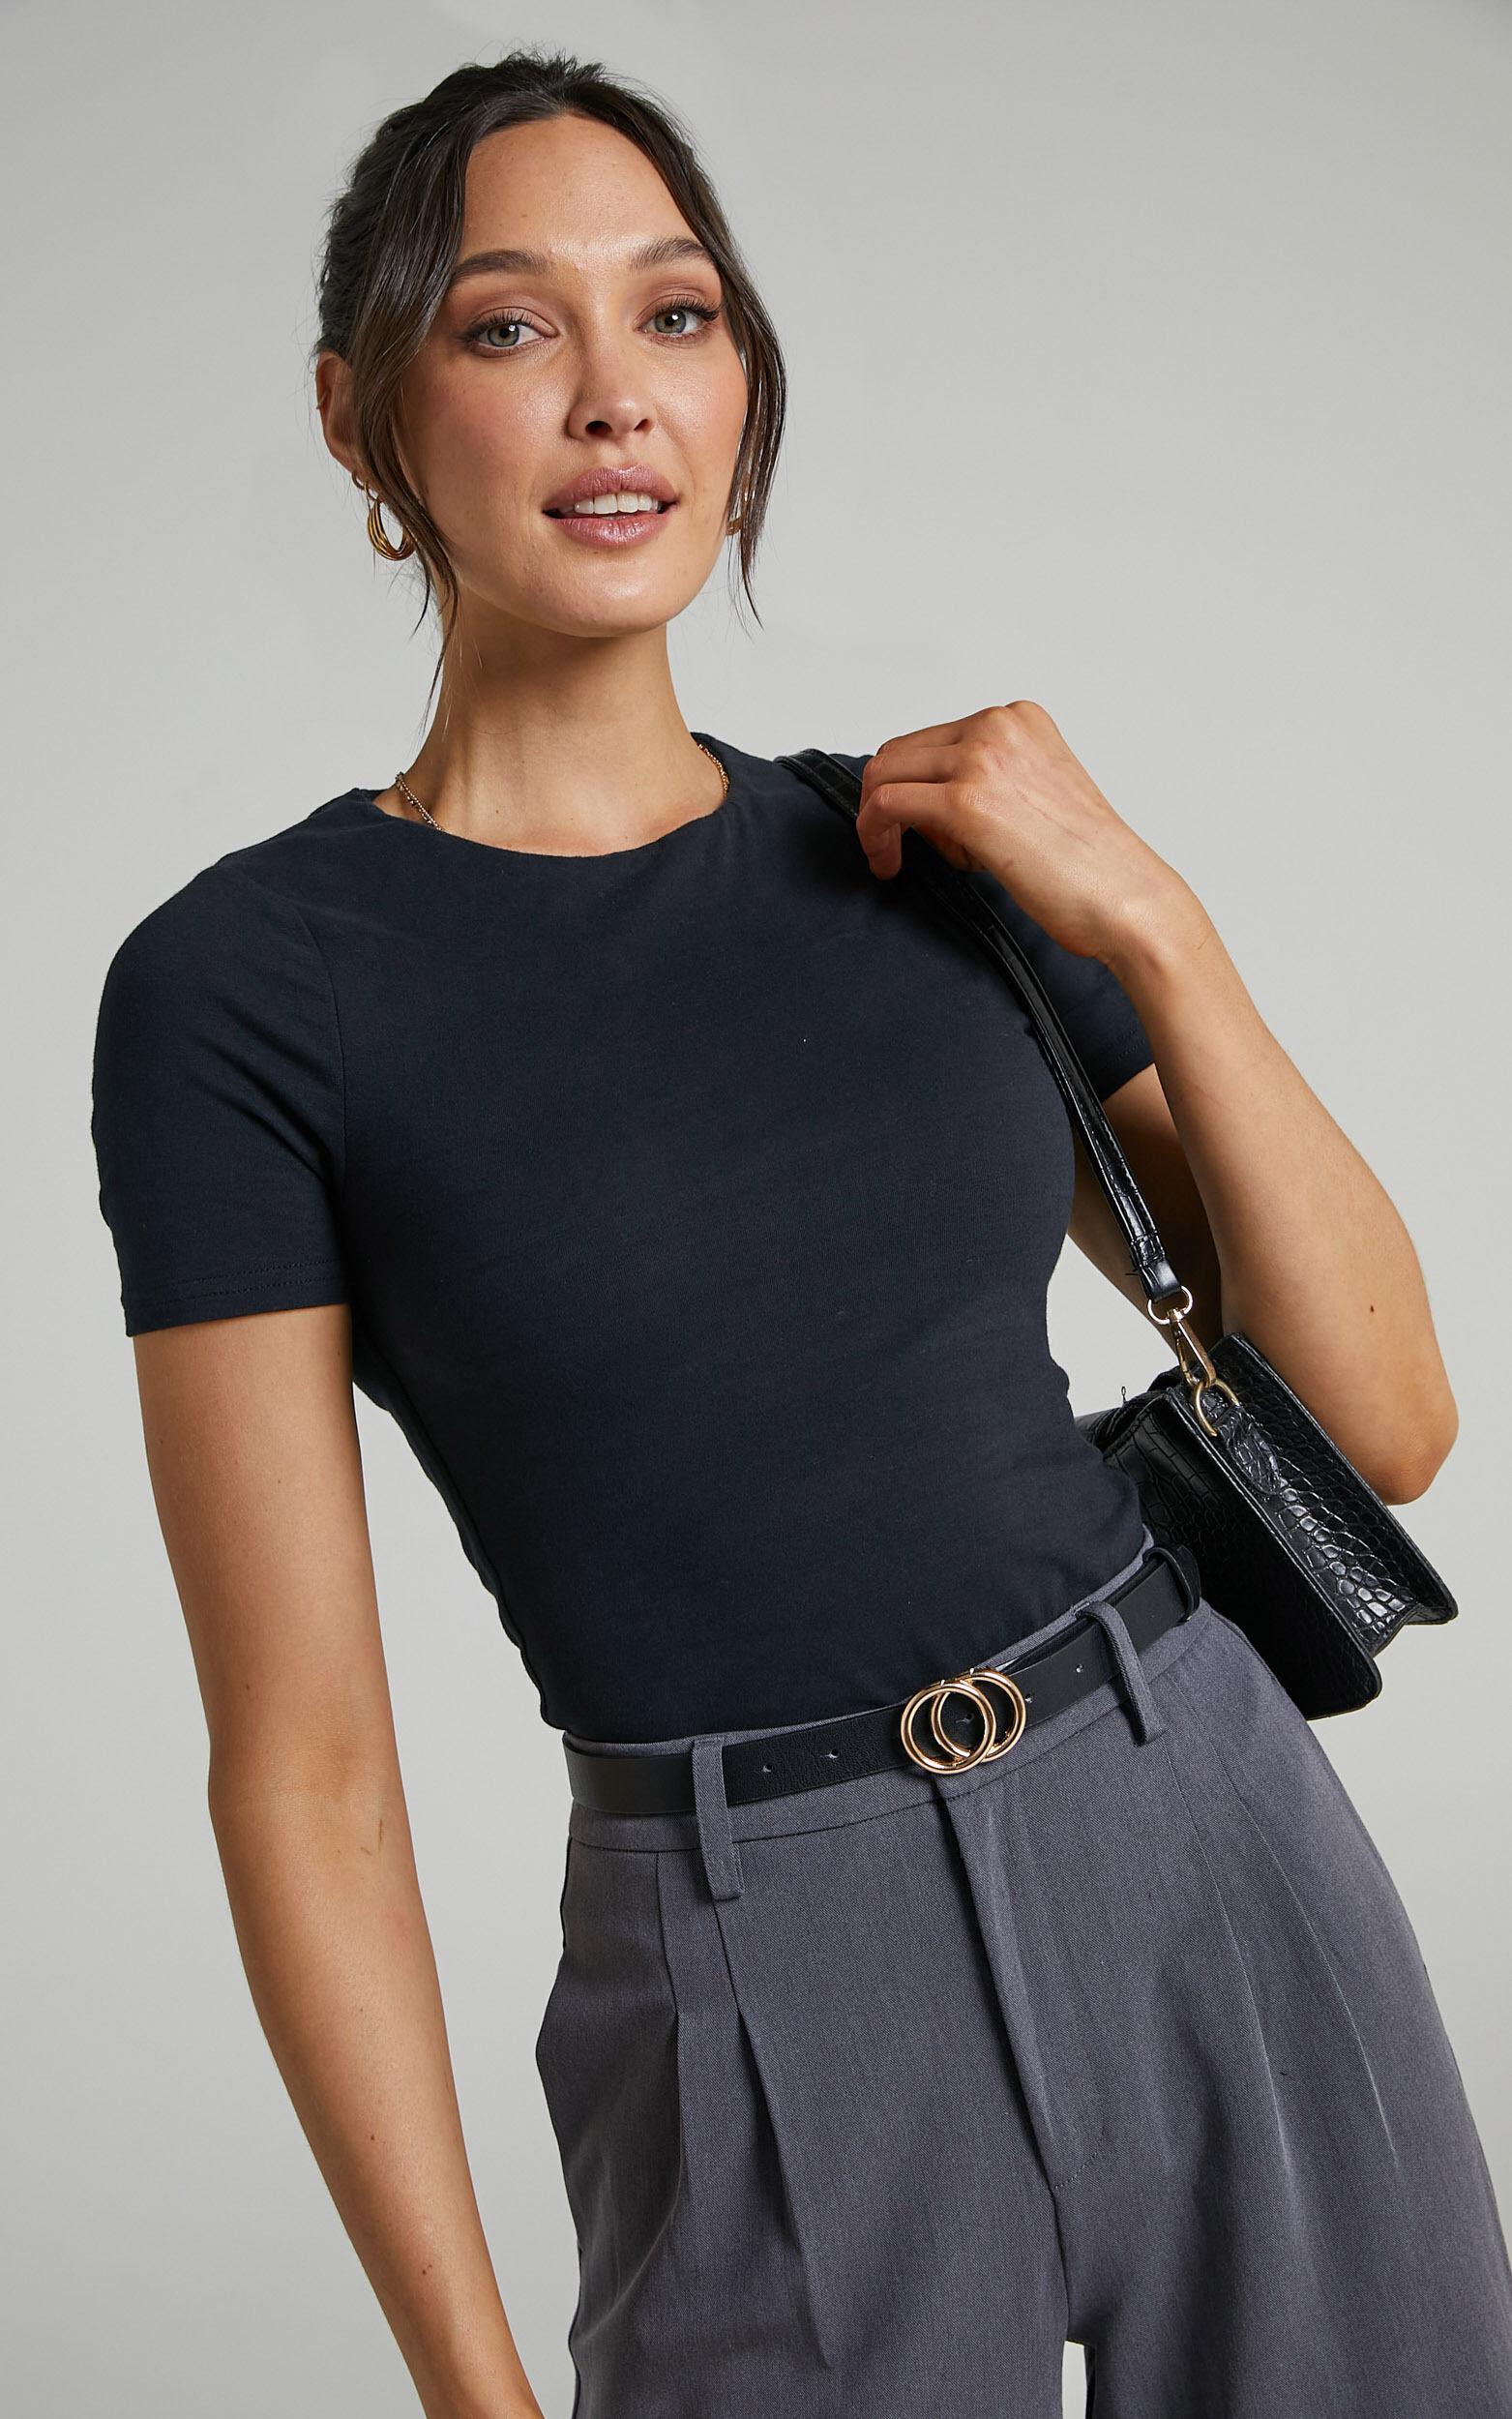 Alexie High Neckline Tshirt in Black - 06, BLK1, super-hi-res image number null